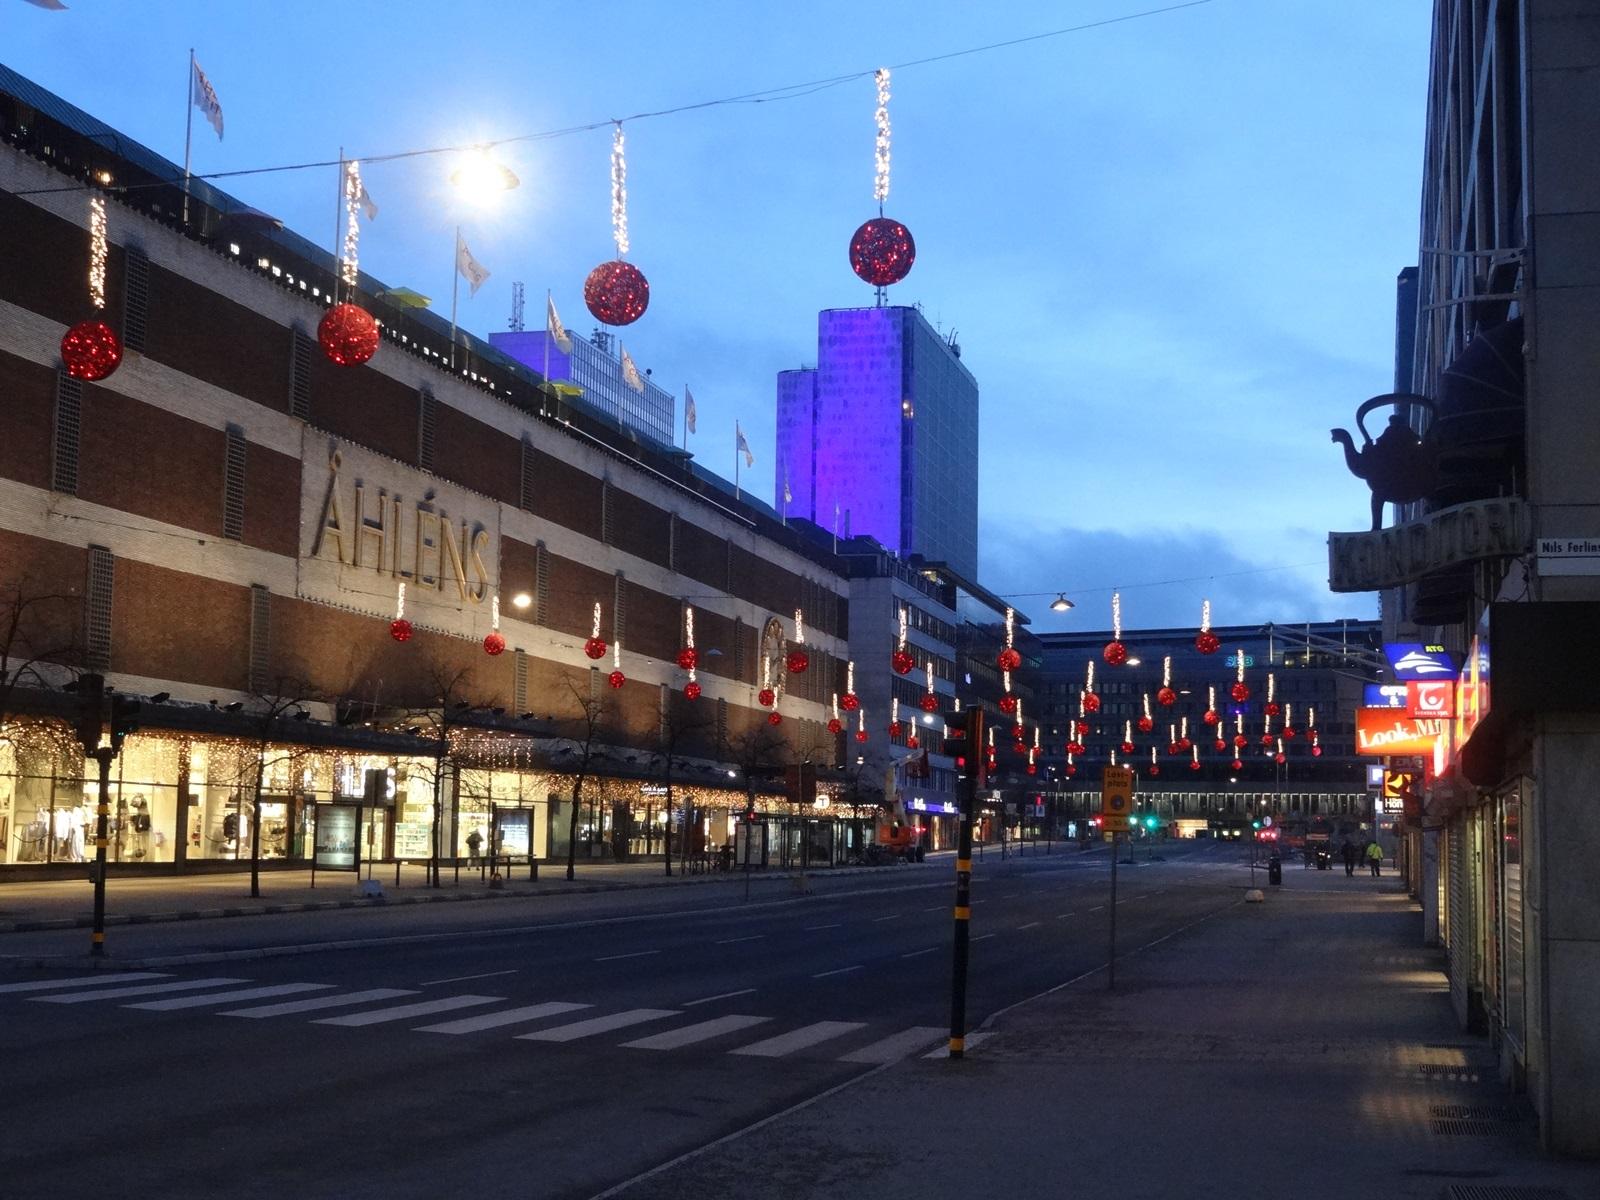 27 sztokholm centrum handlowe Ahlens